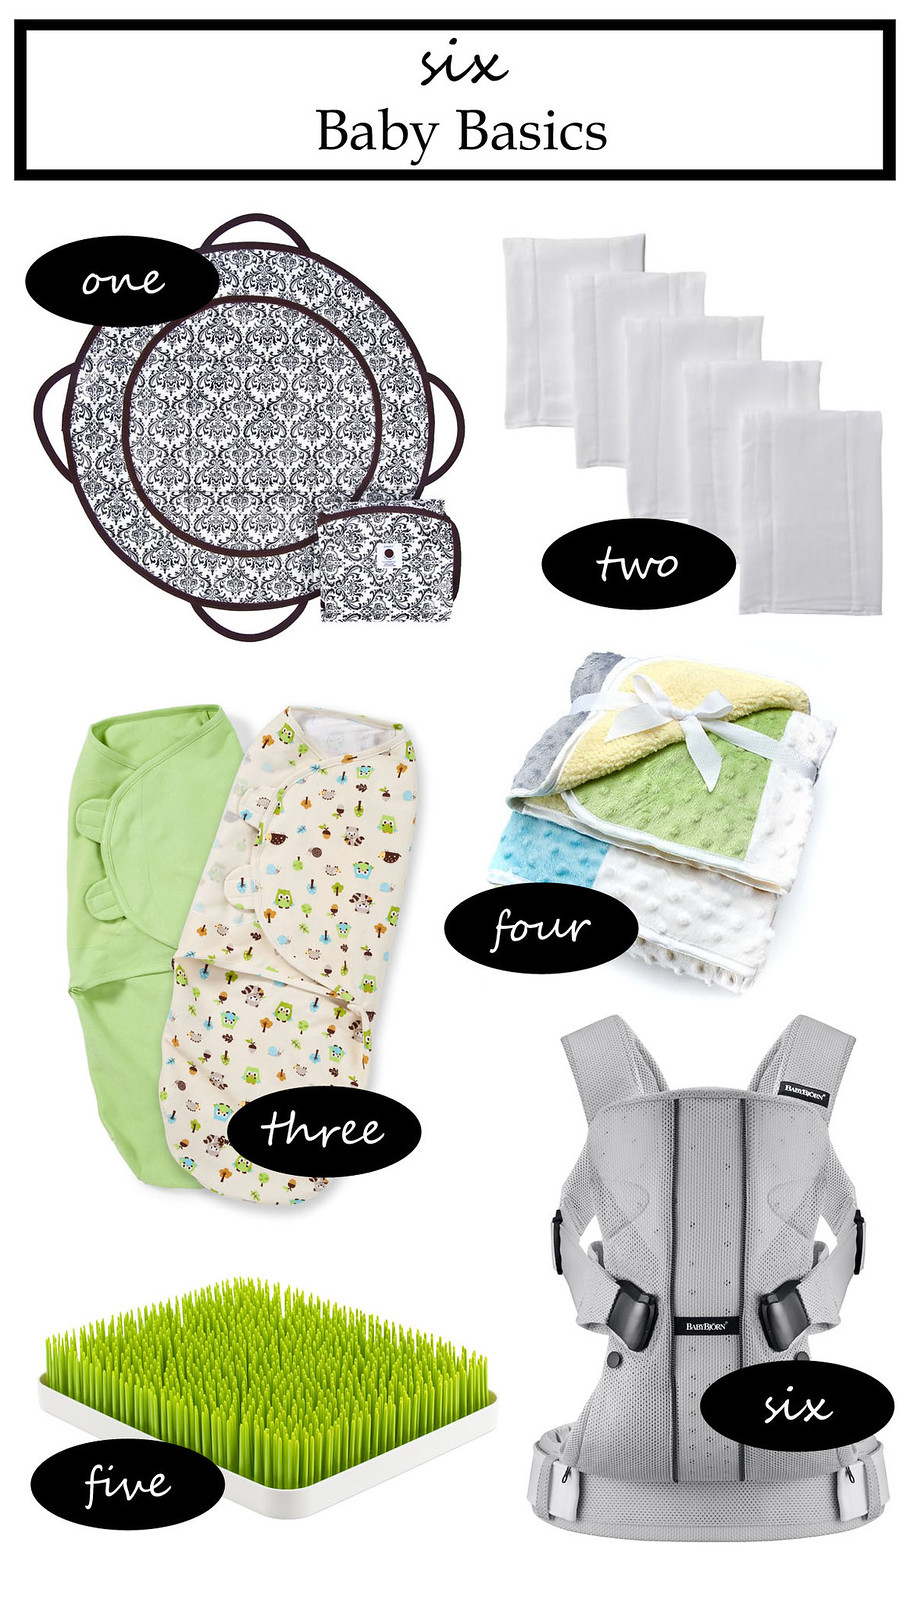 Six Baby Basics | shirley shirley bo birley Blog